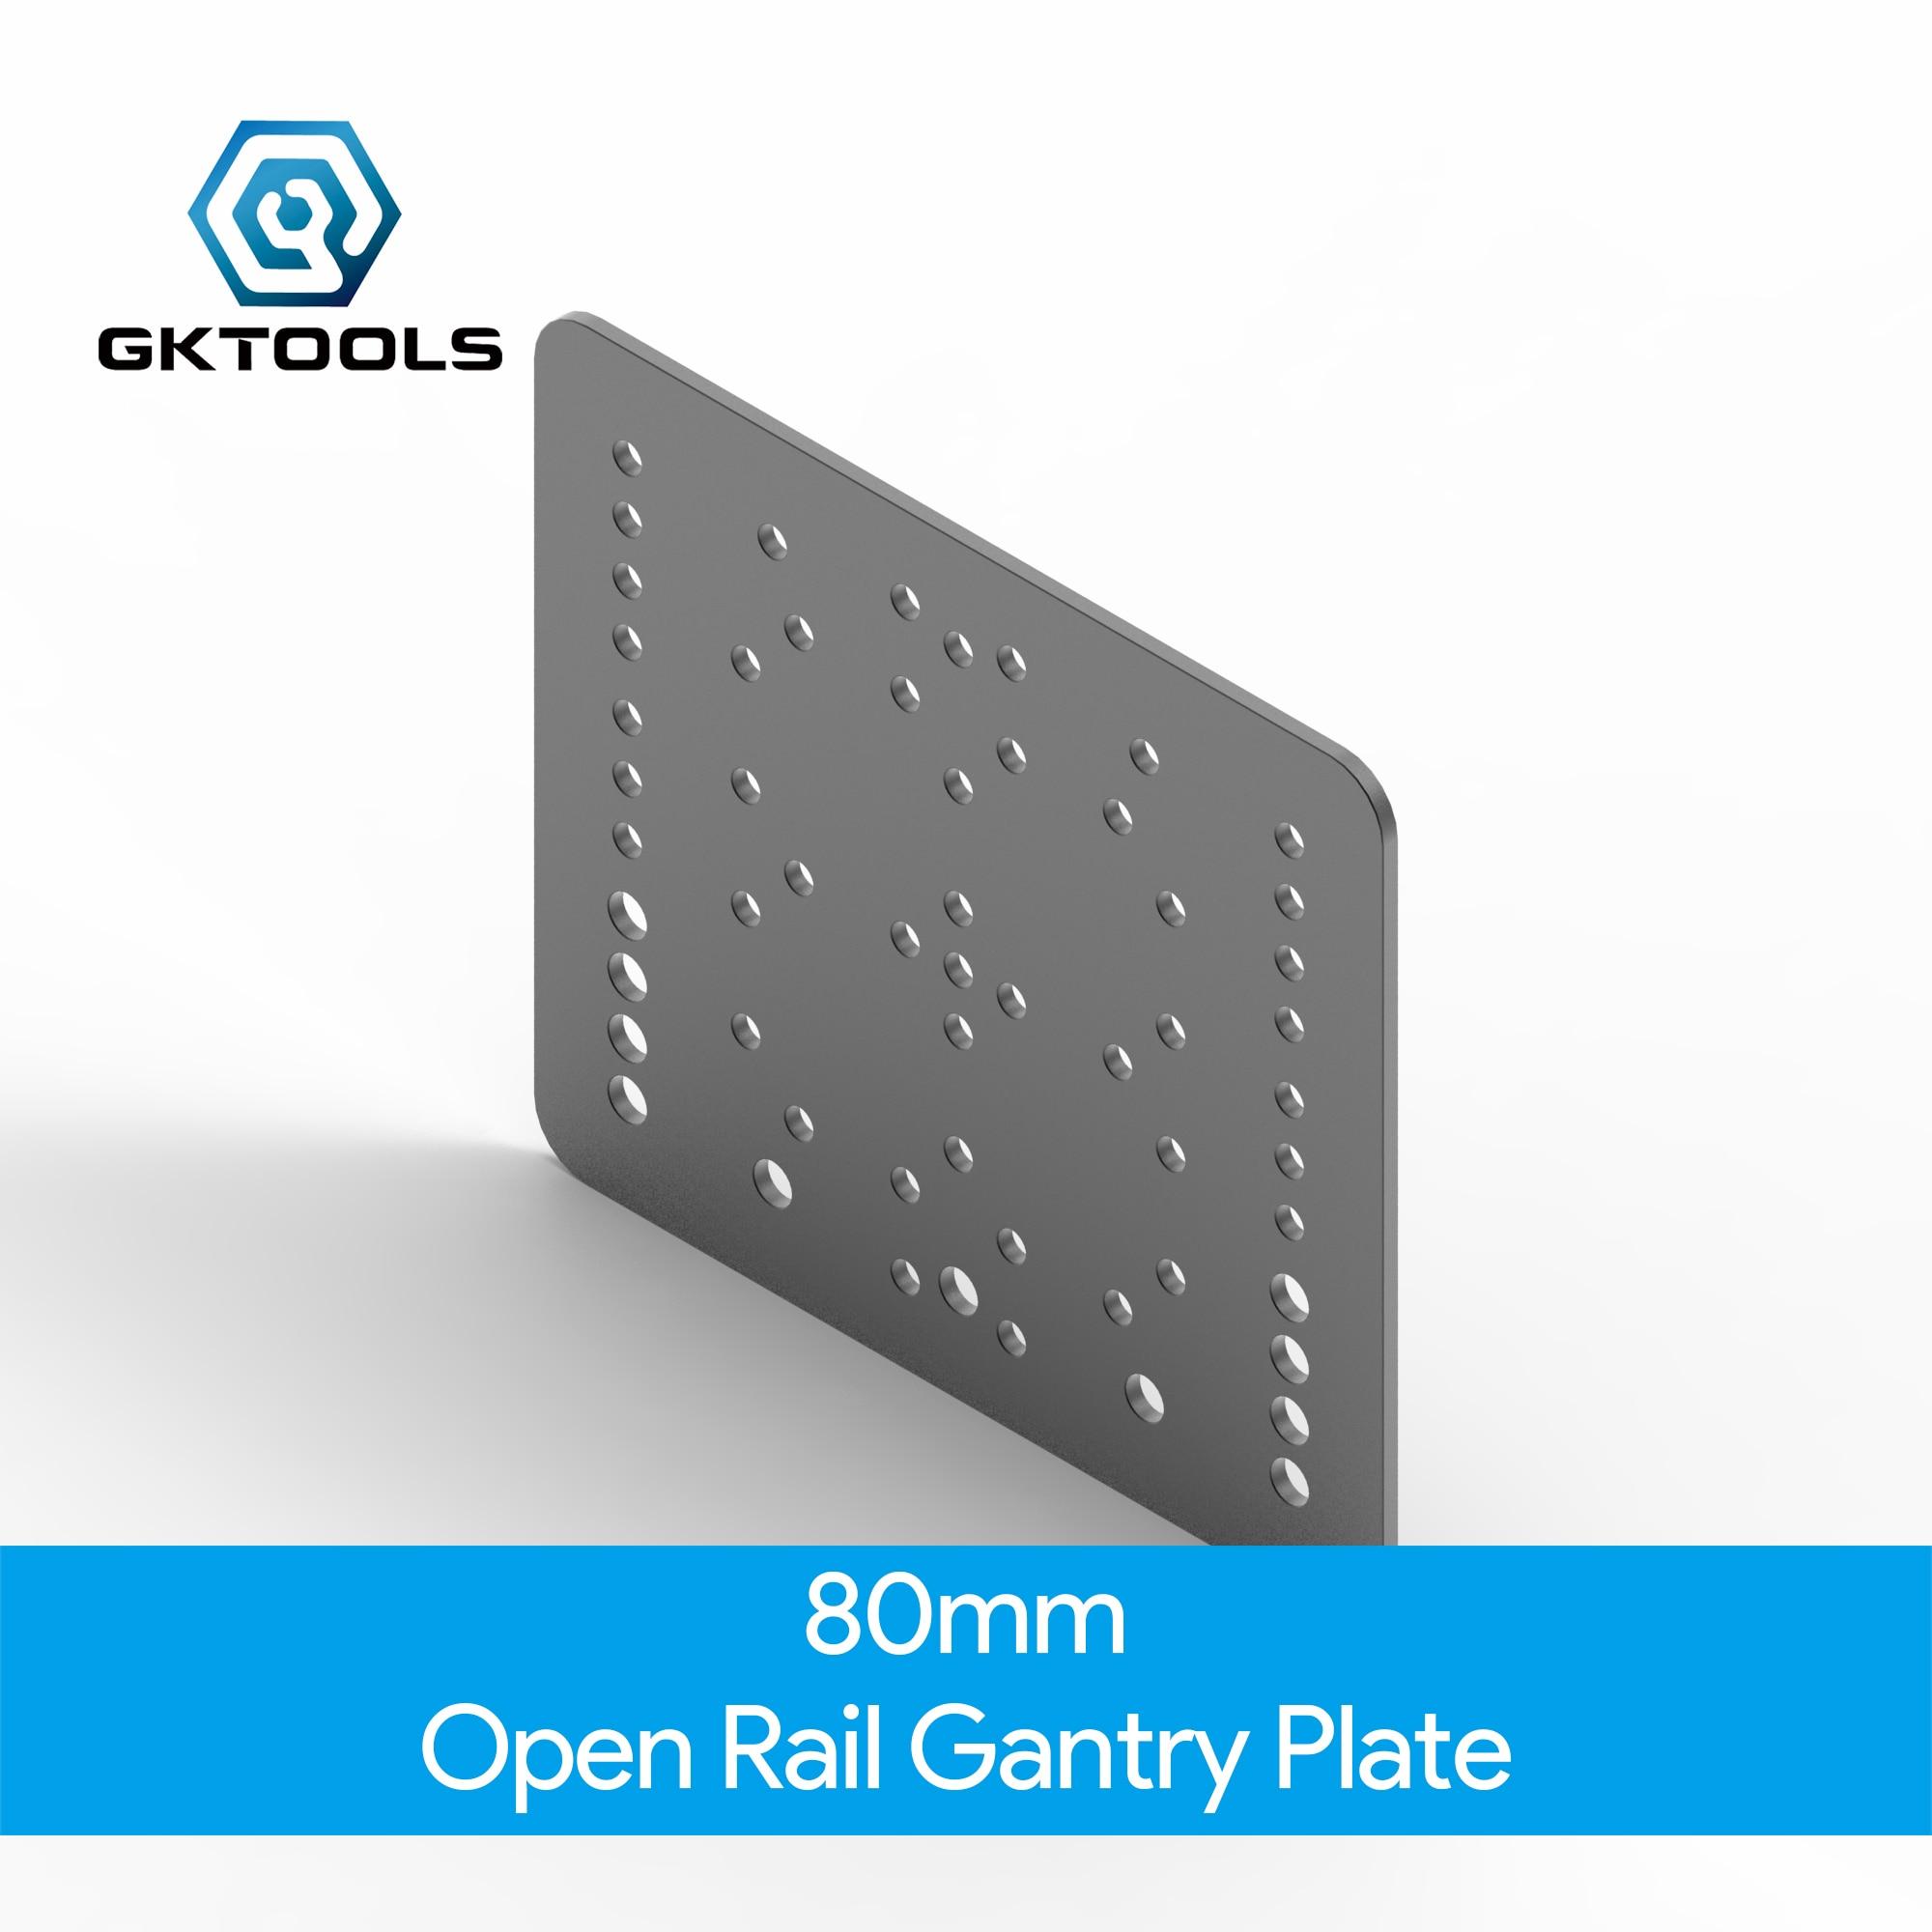 OpenBuilds OpenRail Gantry Plate 80mm